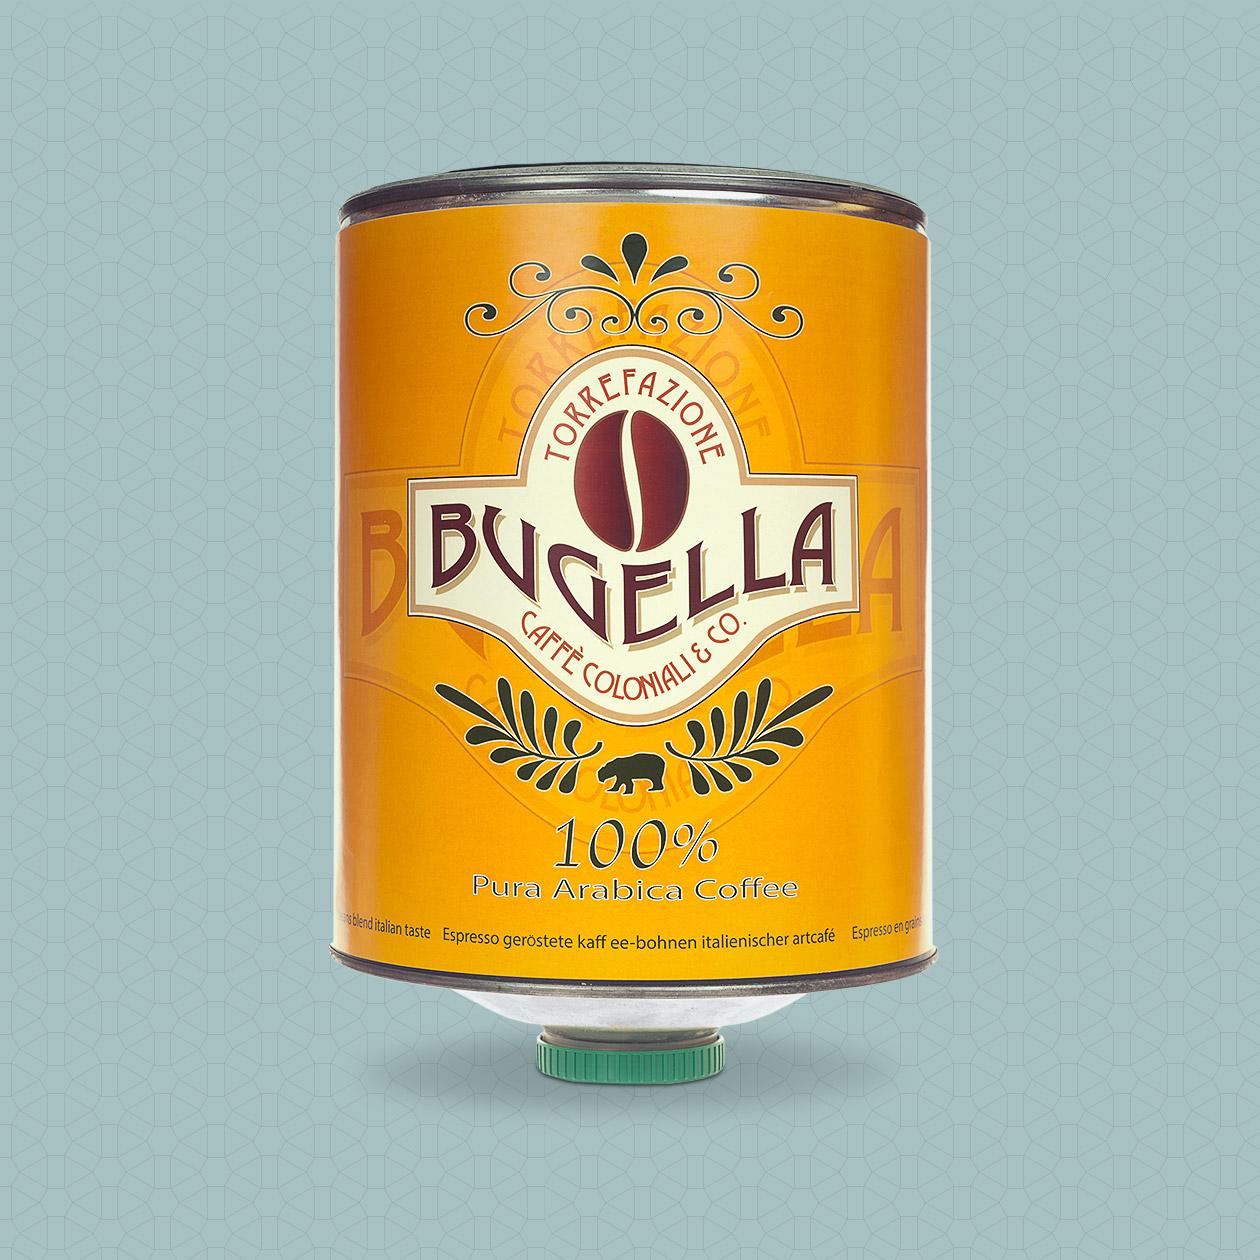 Bugella Galerie Kaffeedose 100% Arabica